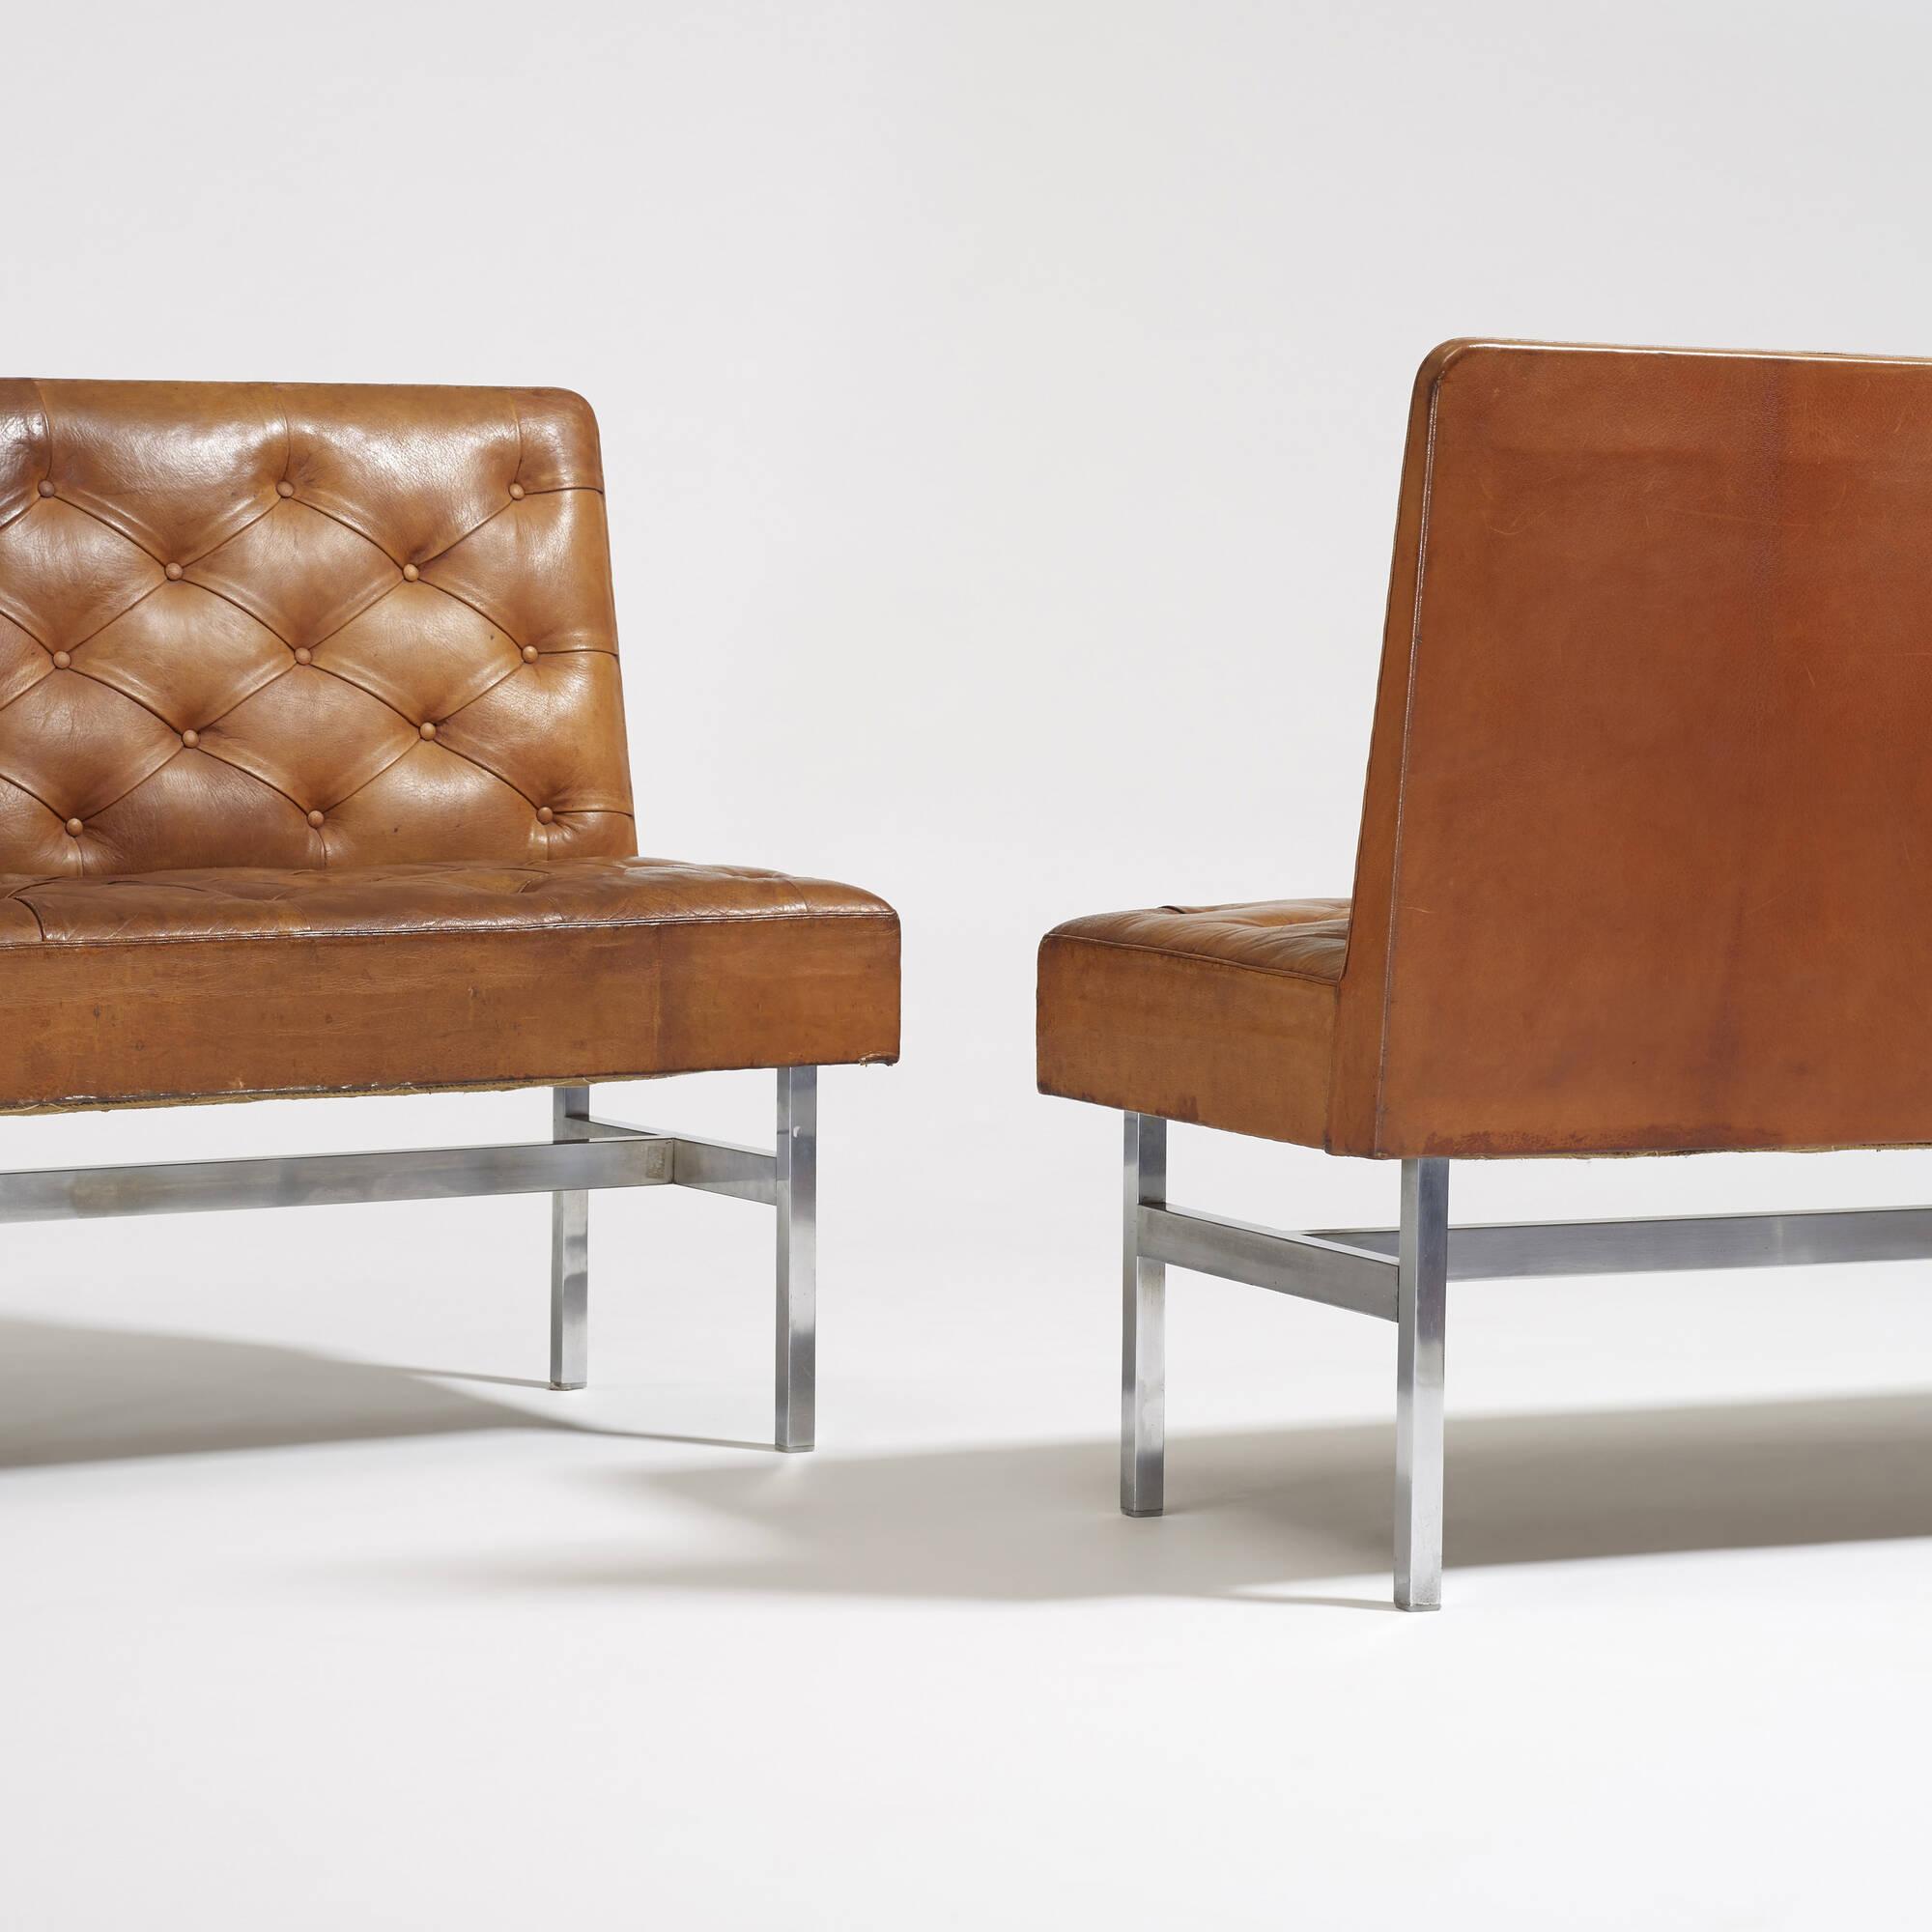 125: Kaare Klint / custom benches, pair (3 of 3)